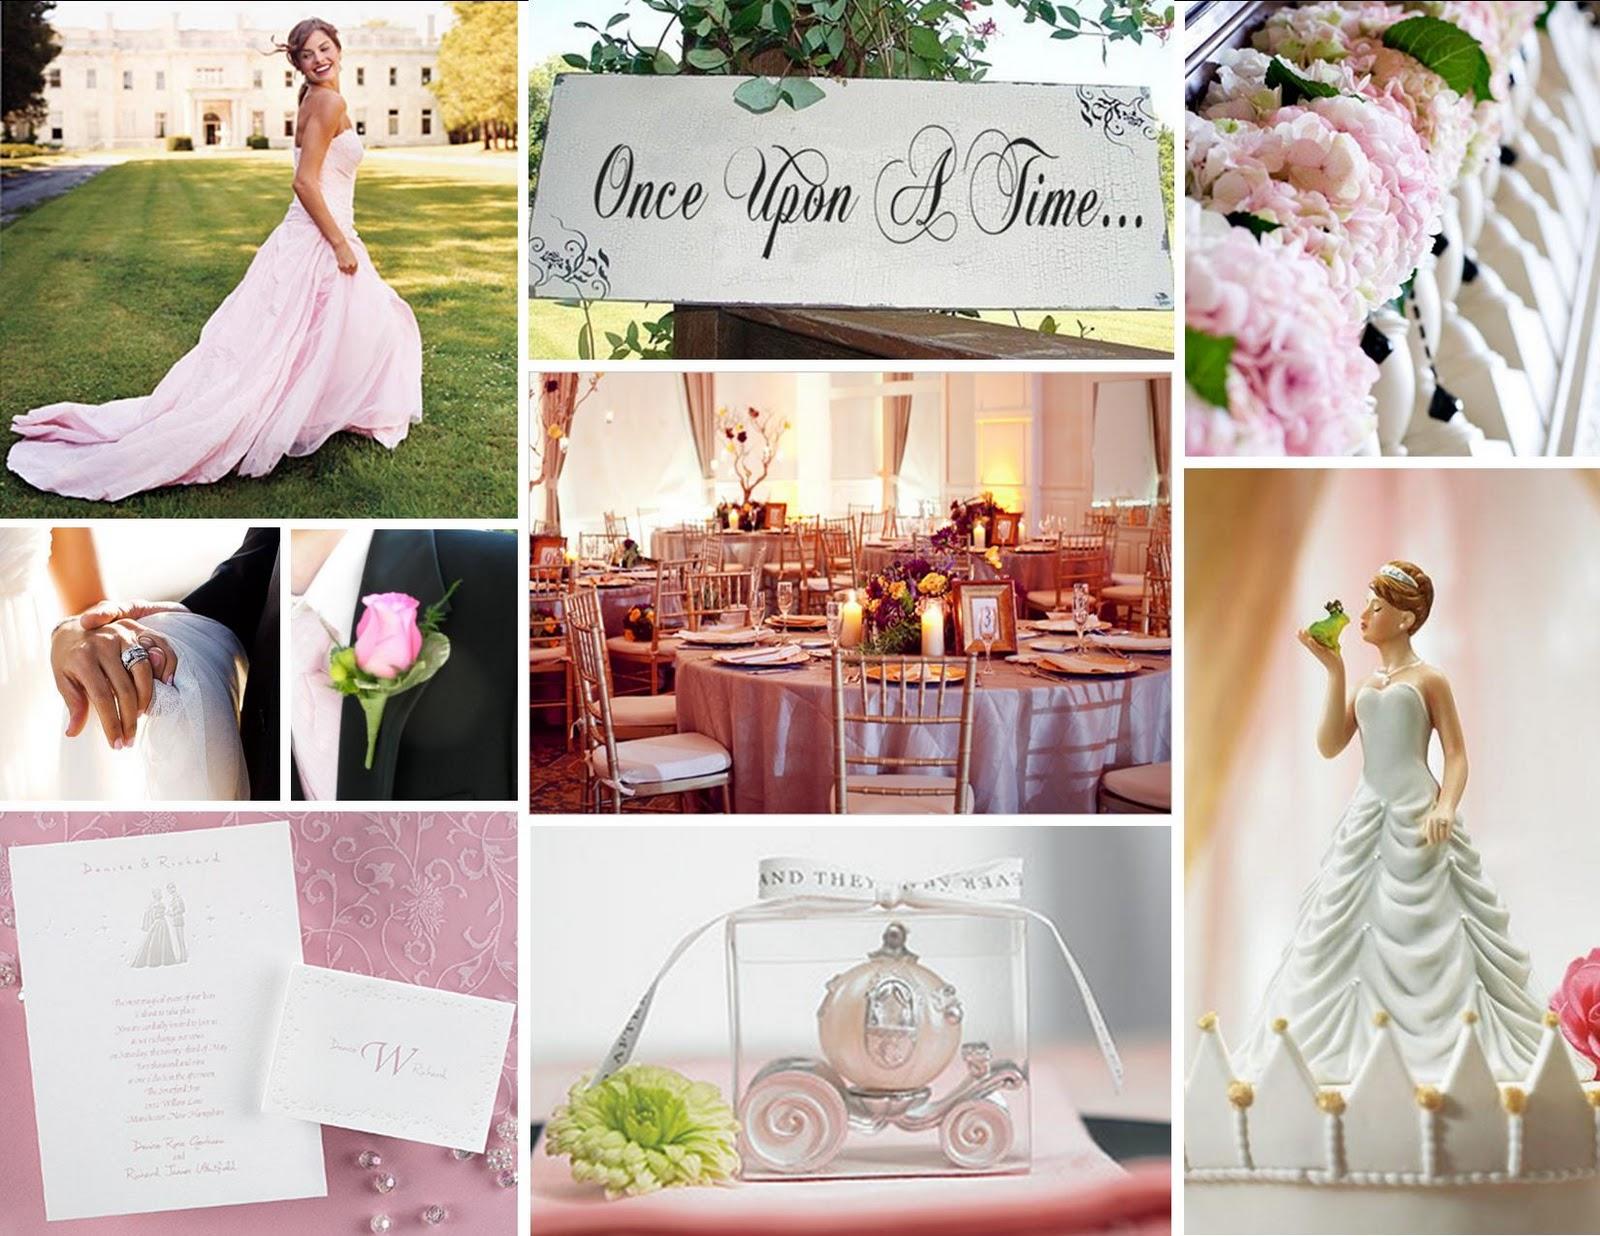 Plan It Event Ideas Princess Wedding Inspiration